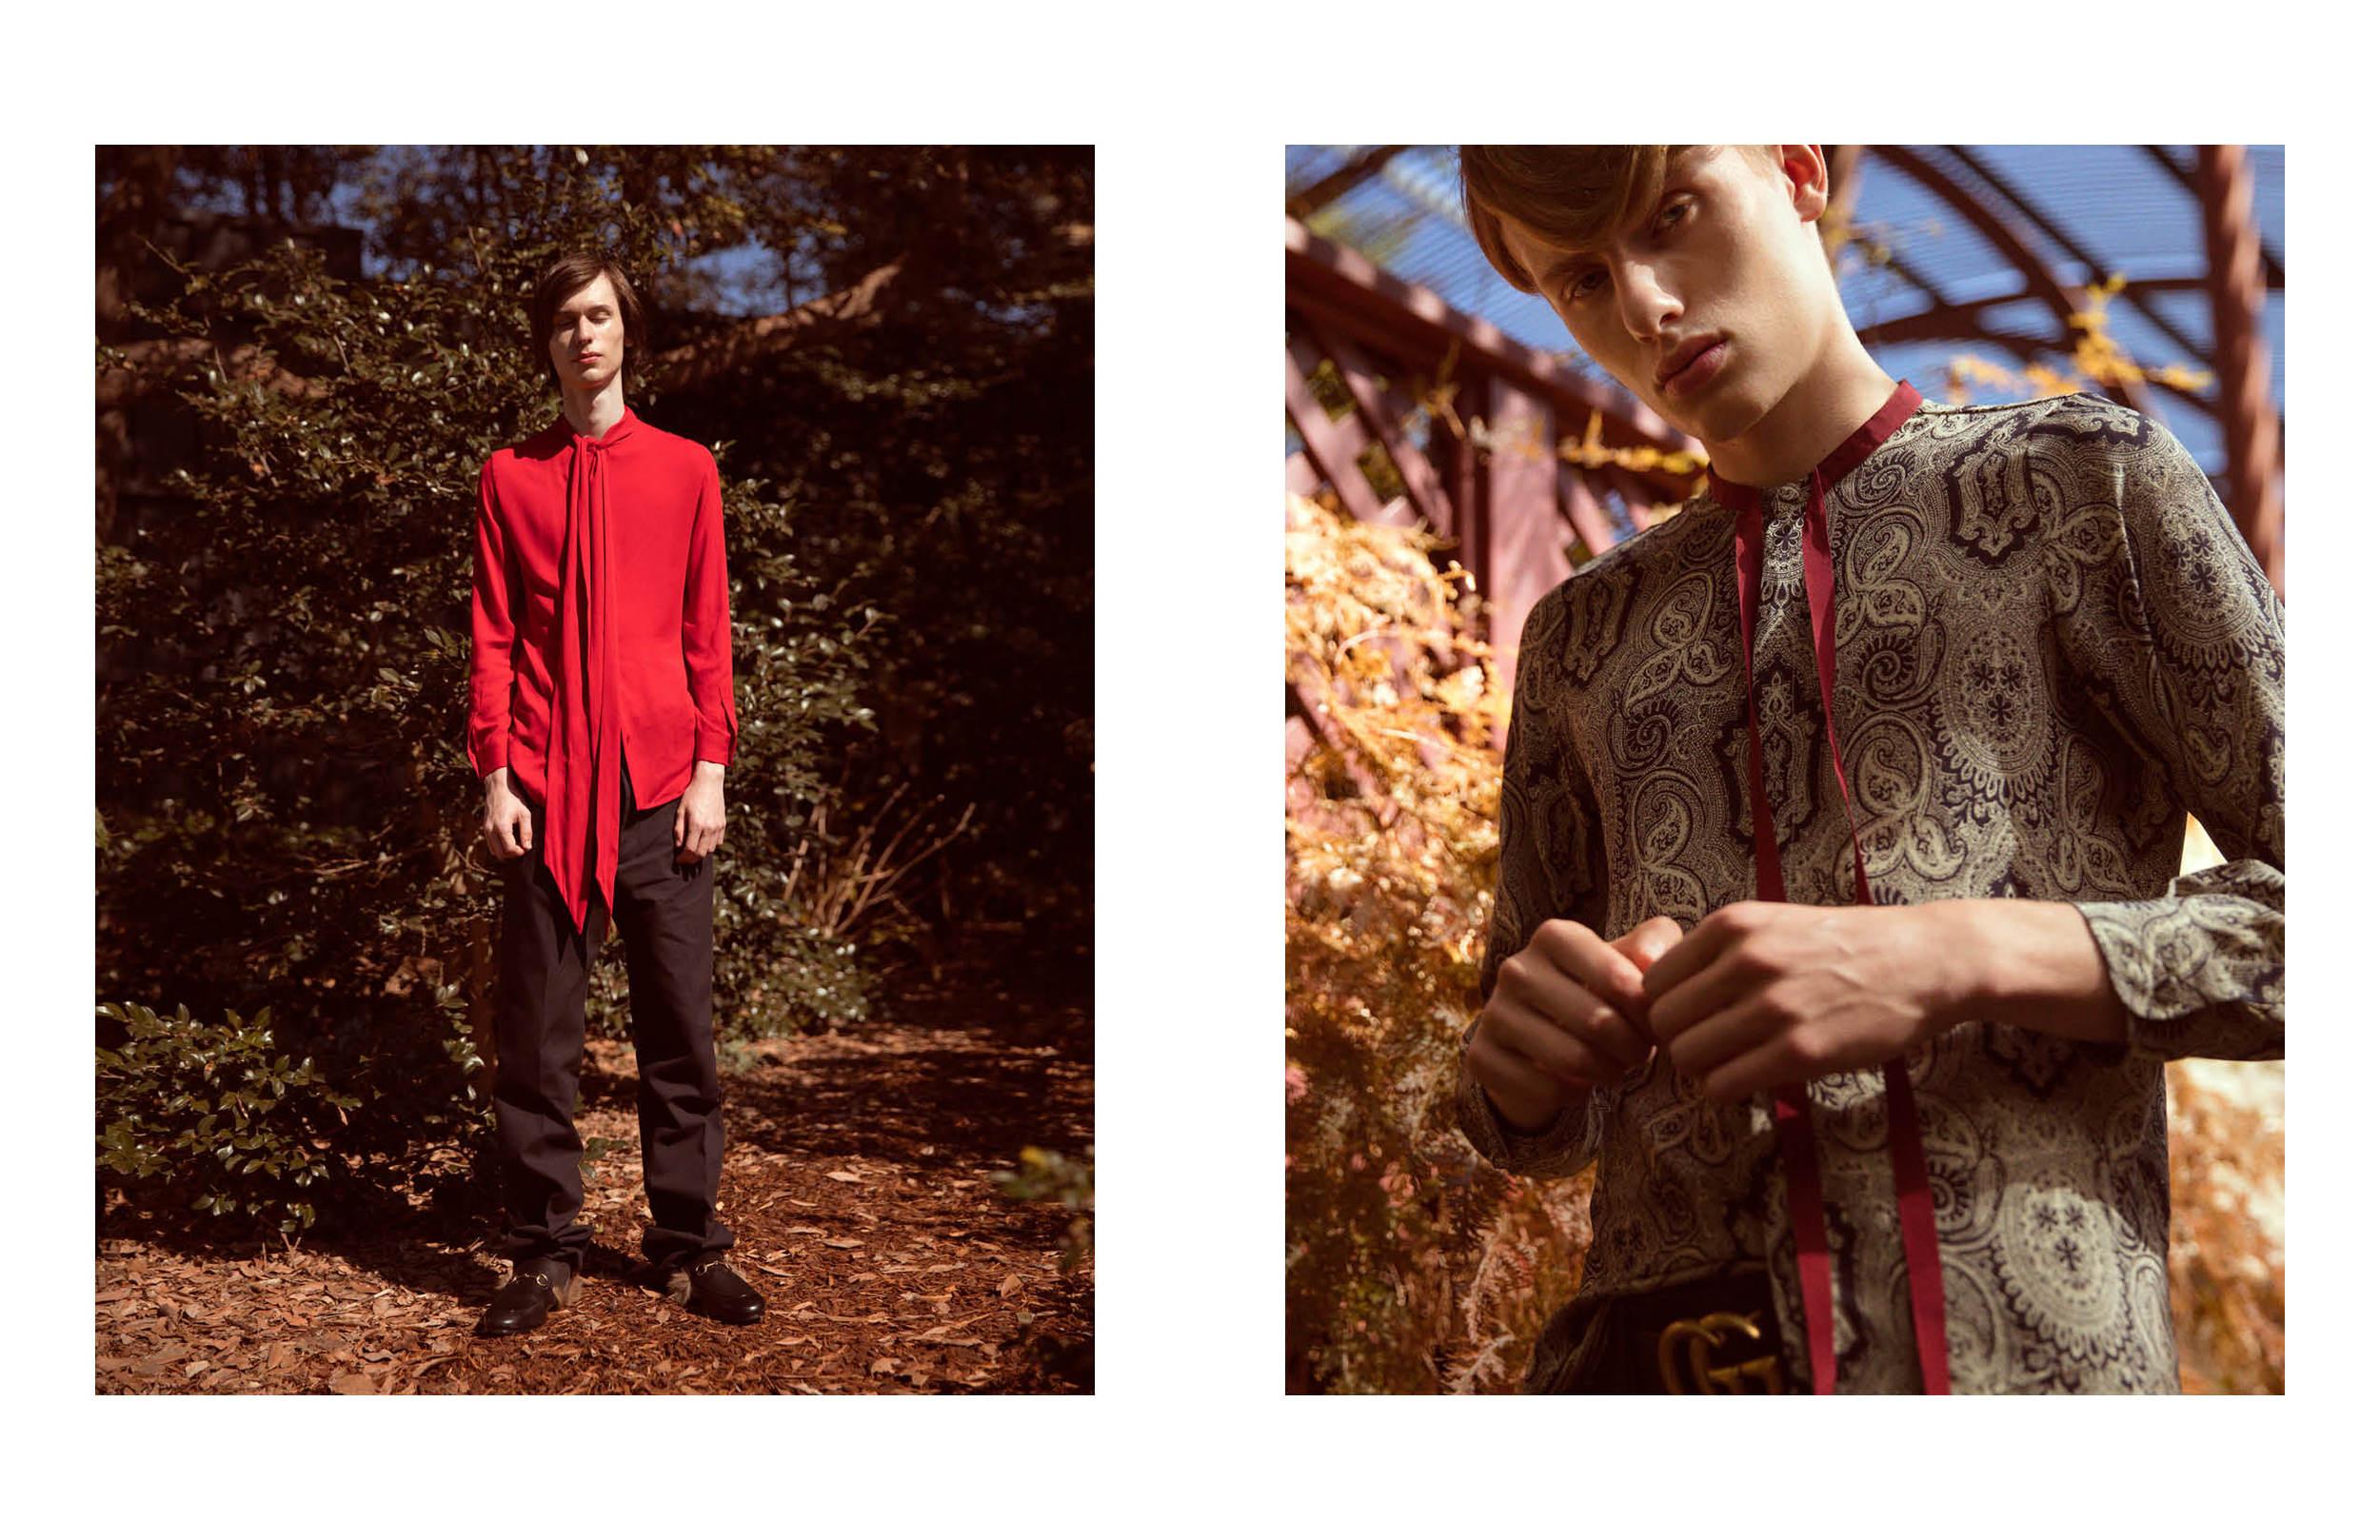 (l  eft to r  ight)Jordan wears Gucci silk shirt, Gucci wool trousers, Gucci fur moccasins   Lemmie wears Gucci floral shirt